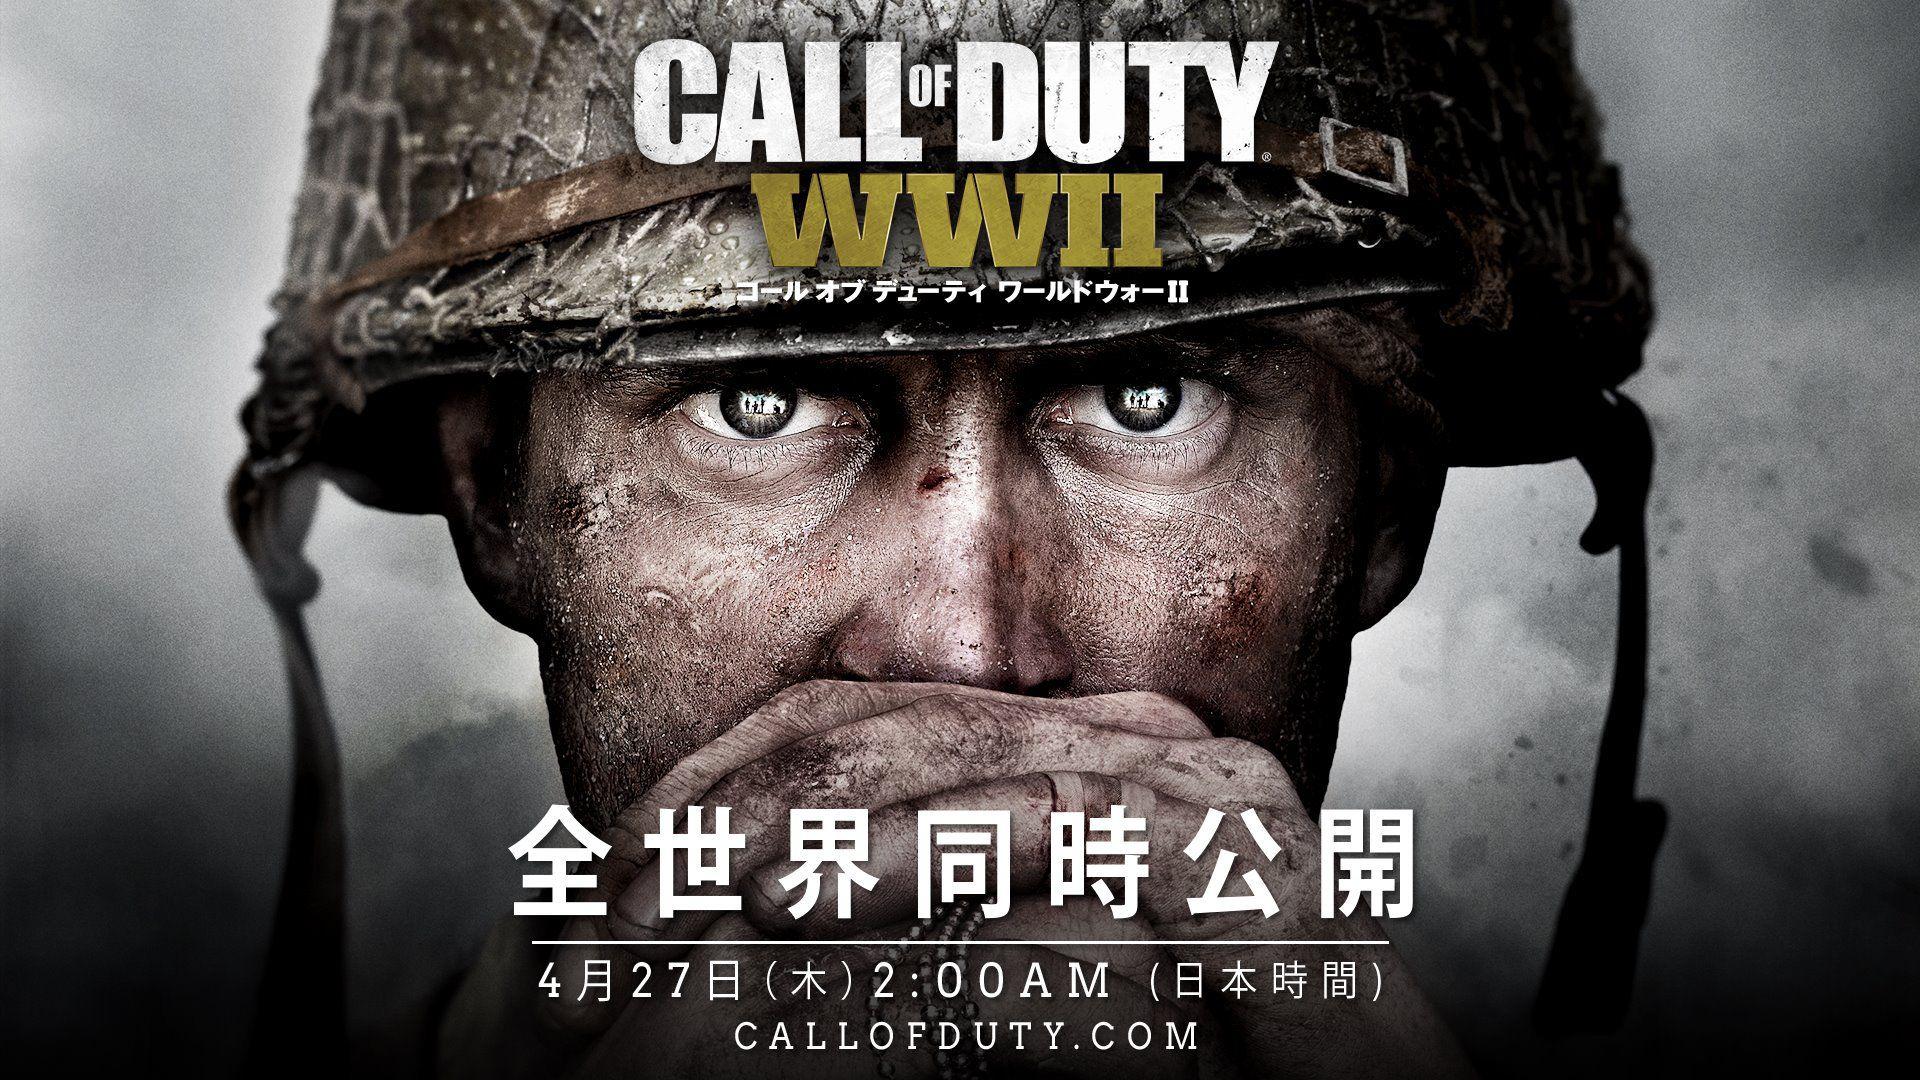 COD WWII コールオブデューティ最新作「COD: WWII」が登場!二次世界大戦作品っぽい